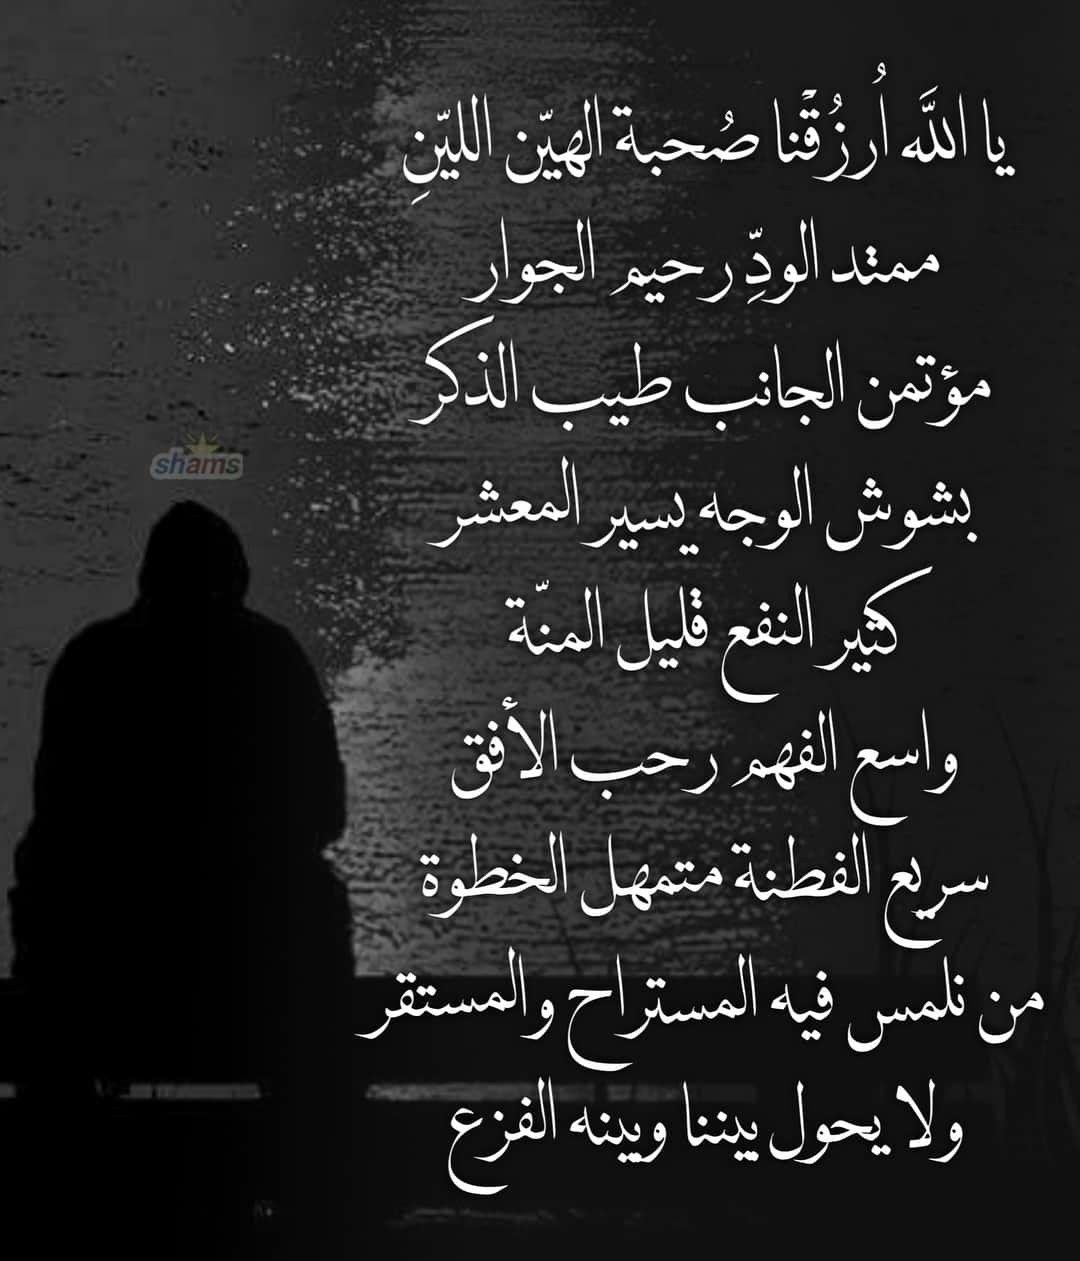 Pin By Hanaa Shoeib On I Love Allah Quran Islam The Prophet Miracles Hadith Heaven Prophets Faith Prayer Dua حكم وعبر احاديث الله اسلام قرآن دعاء Islam Hadith Quotes Hadith